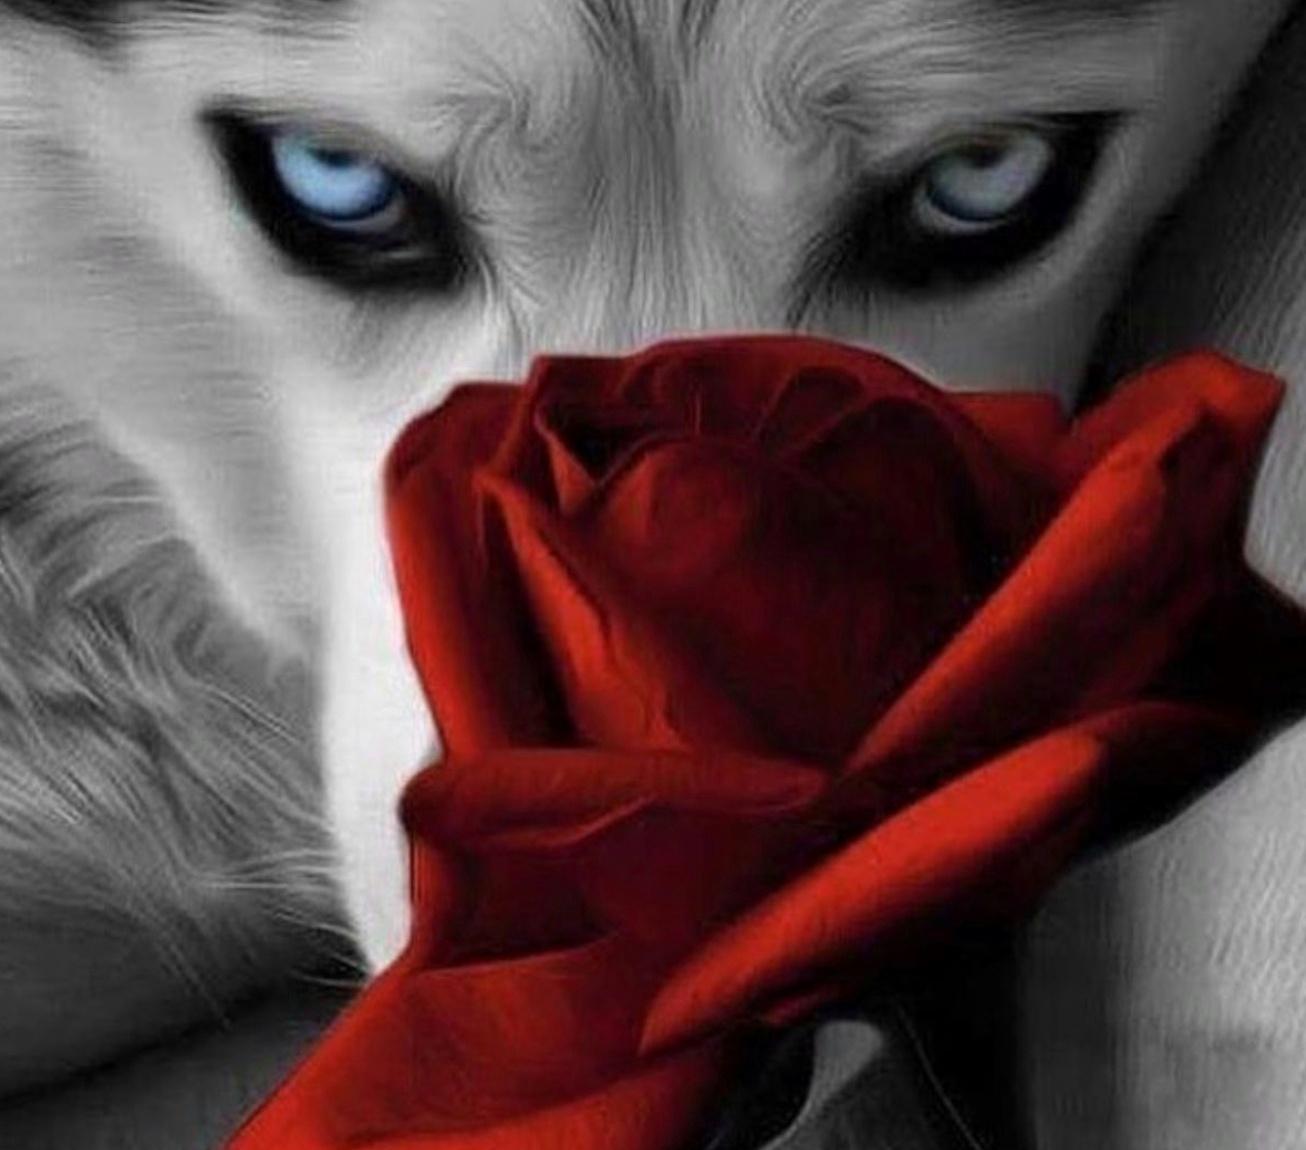 фото волк с розой в зубах добровольцев